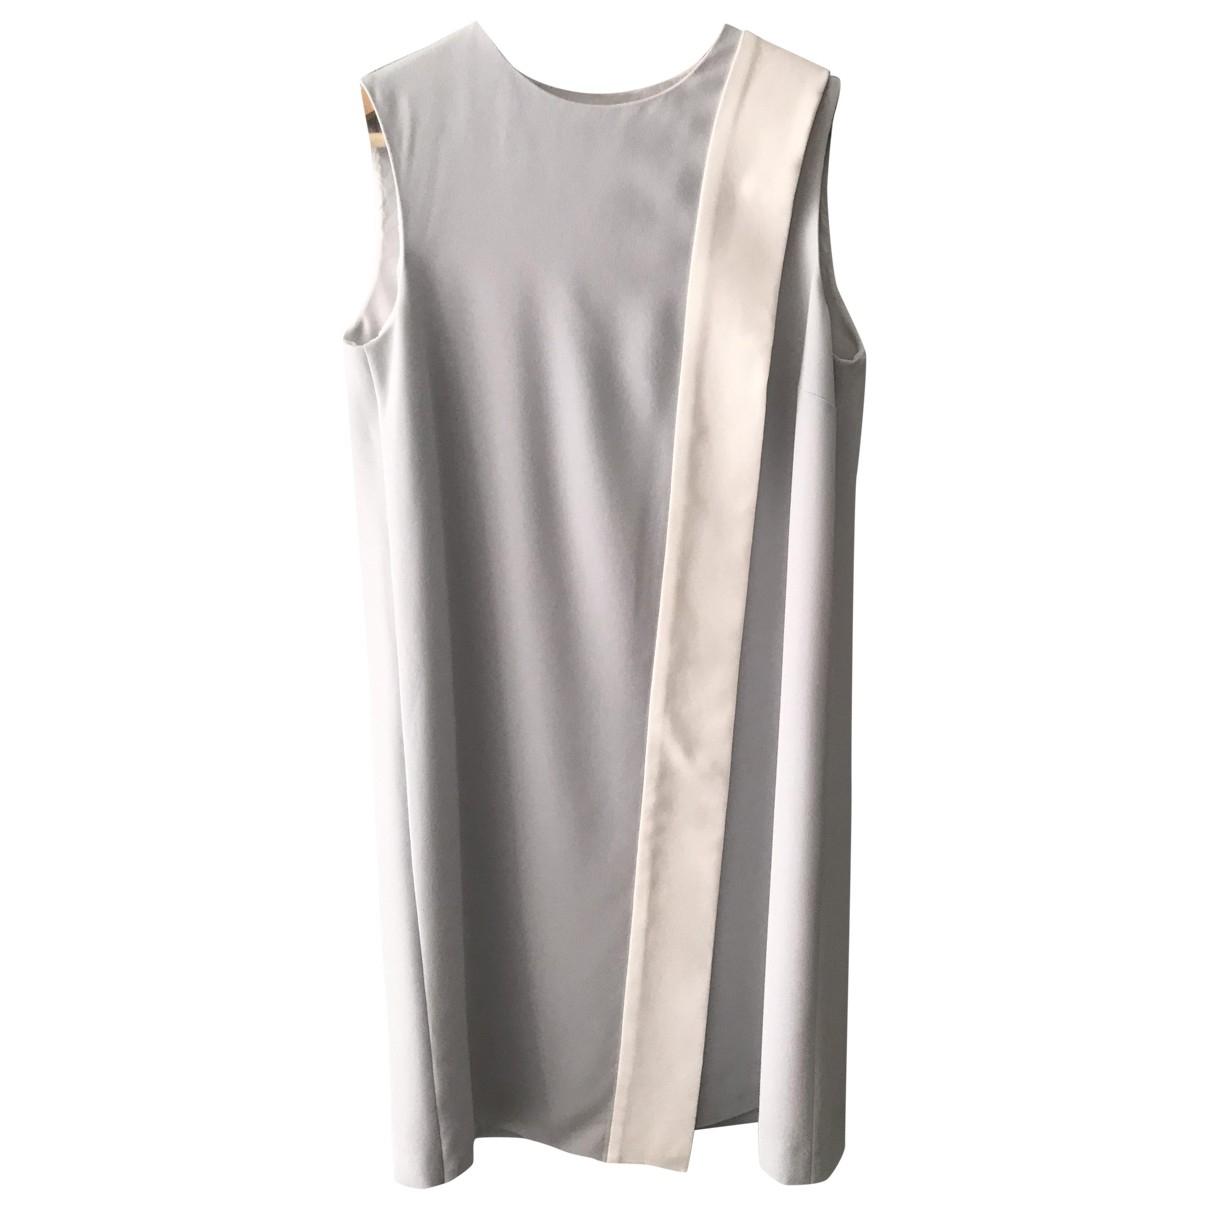 Joseph \N Kleid in  Anthrazit Polyester